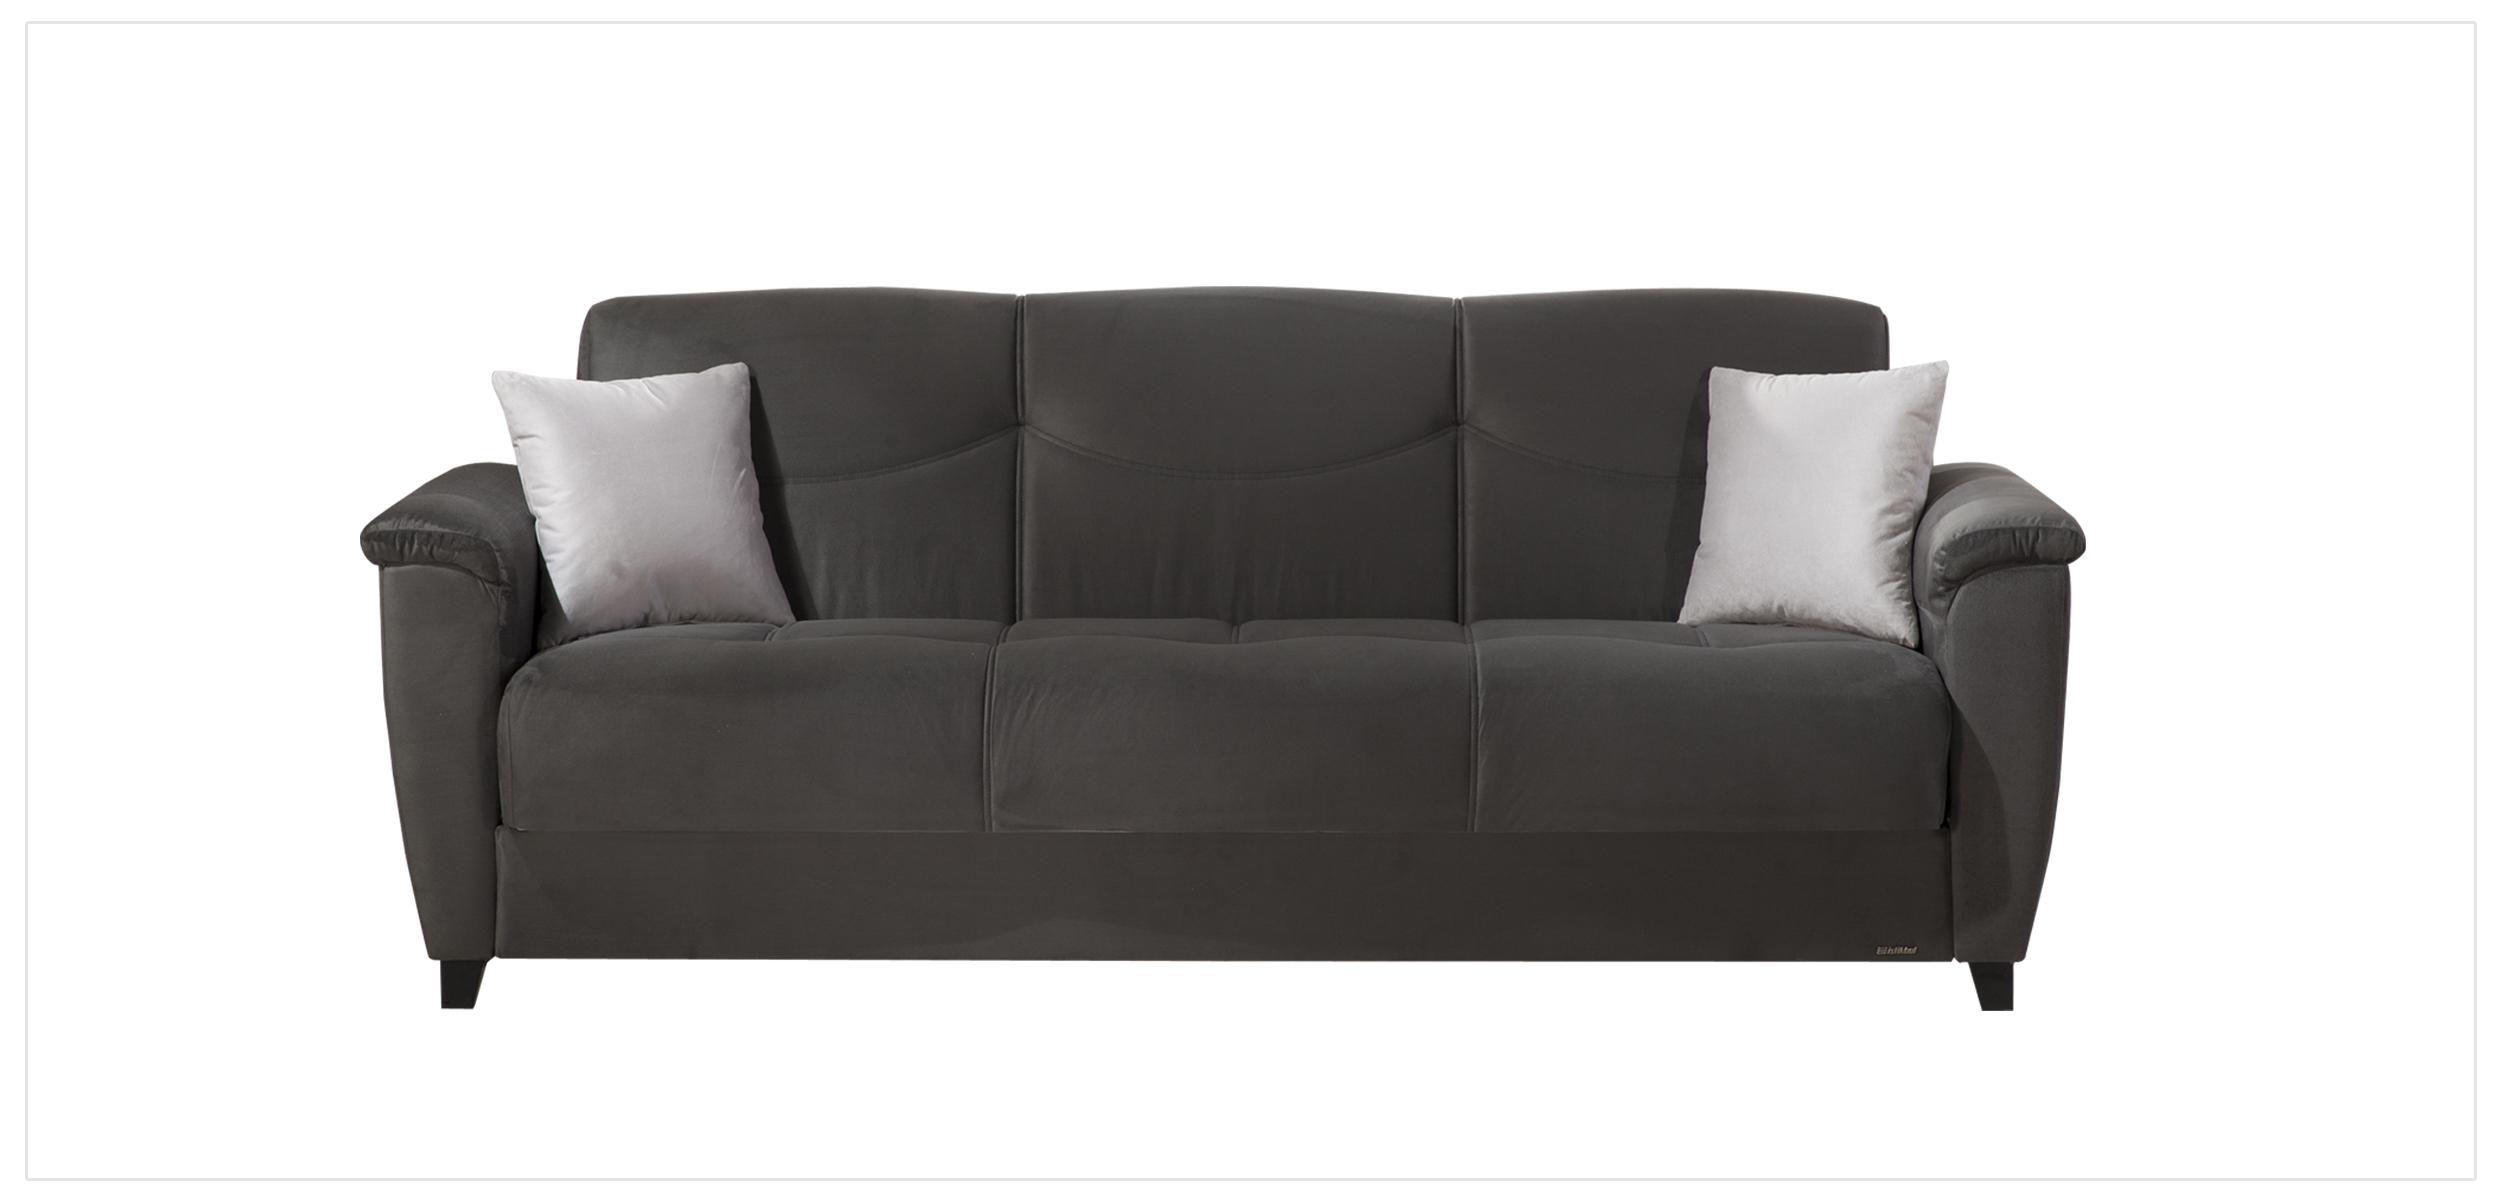 aspen rainbow dark grey convertible sofa bed by sunset night